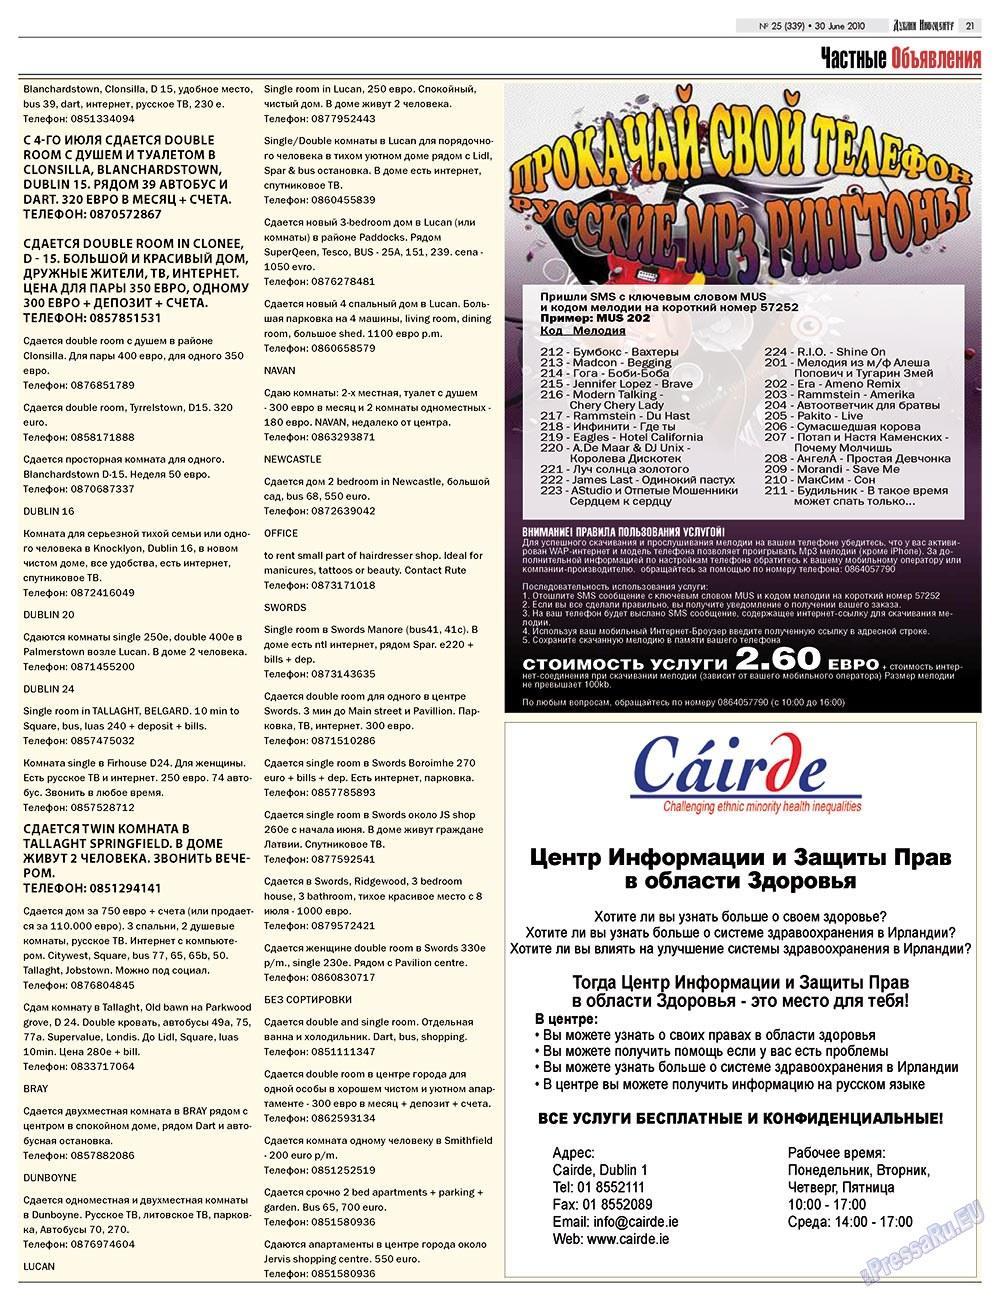 Дублин инфоцентр (газета). 2010 год, номер 25, стр. 21